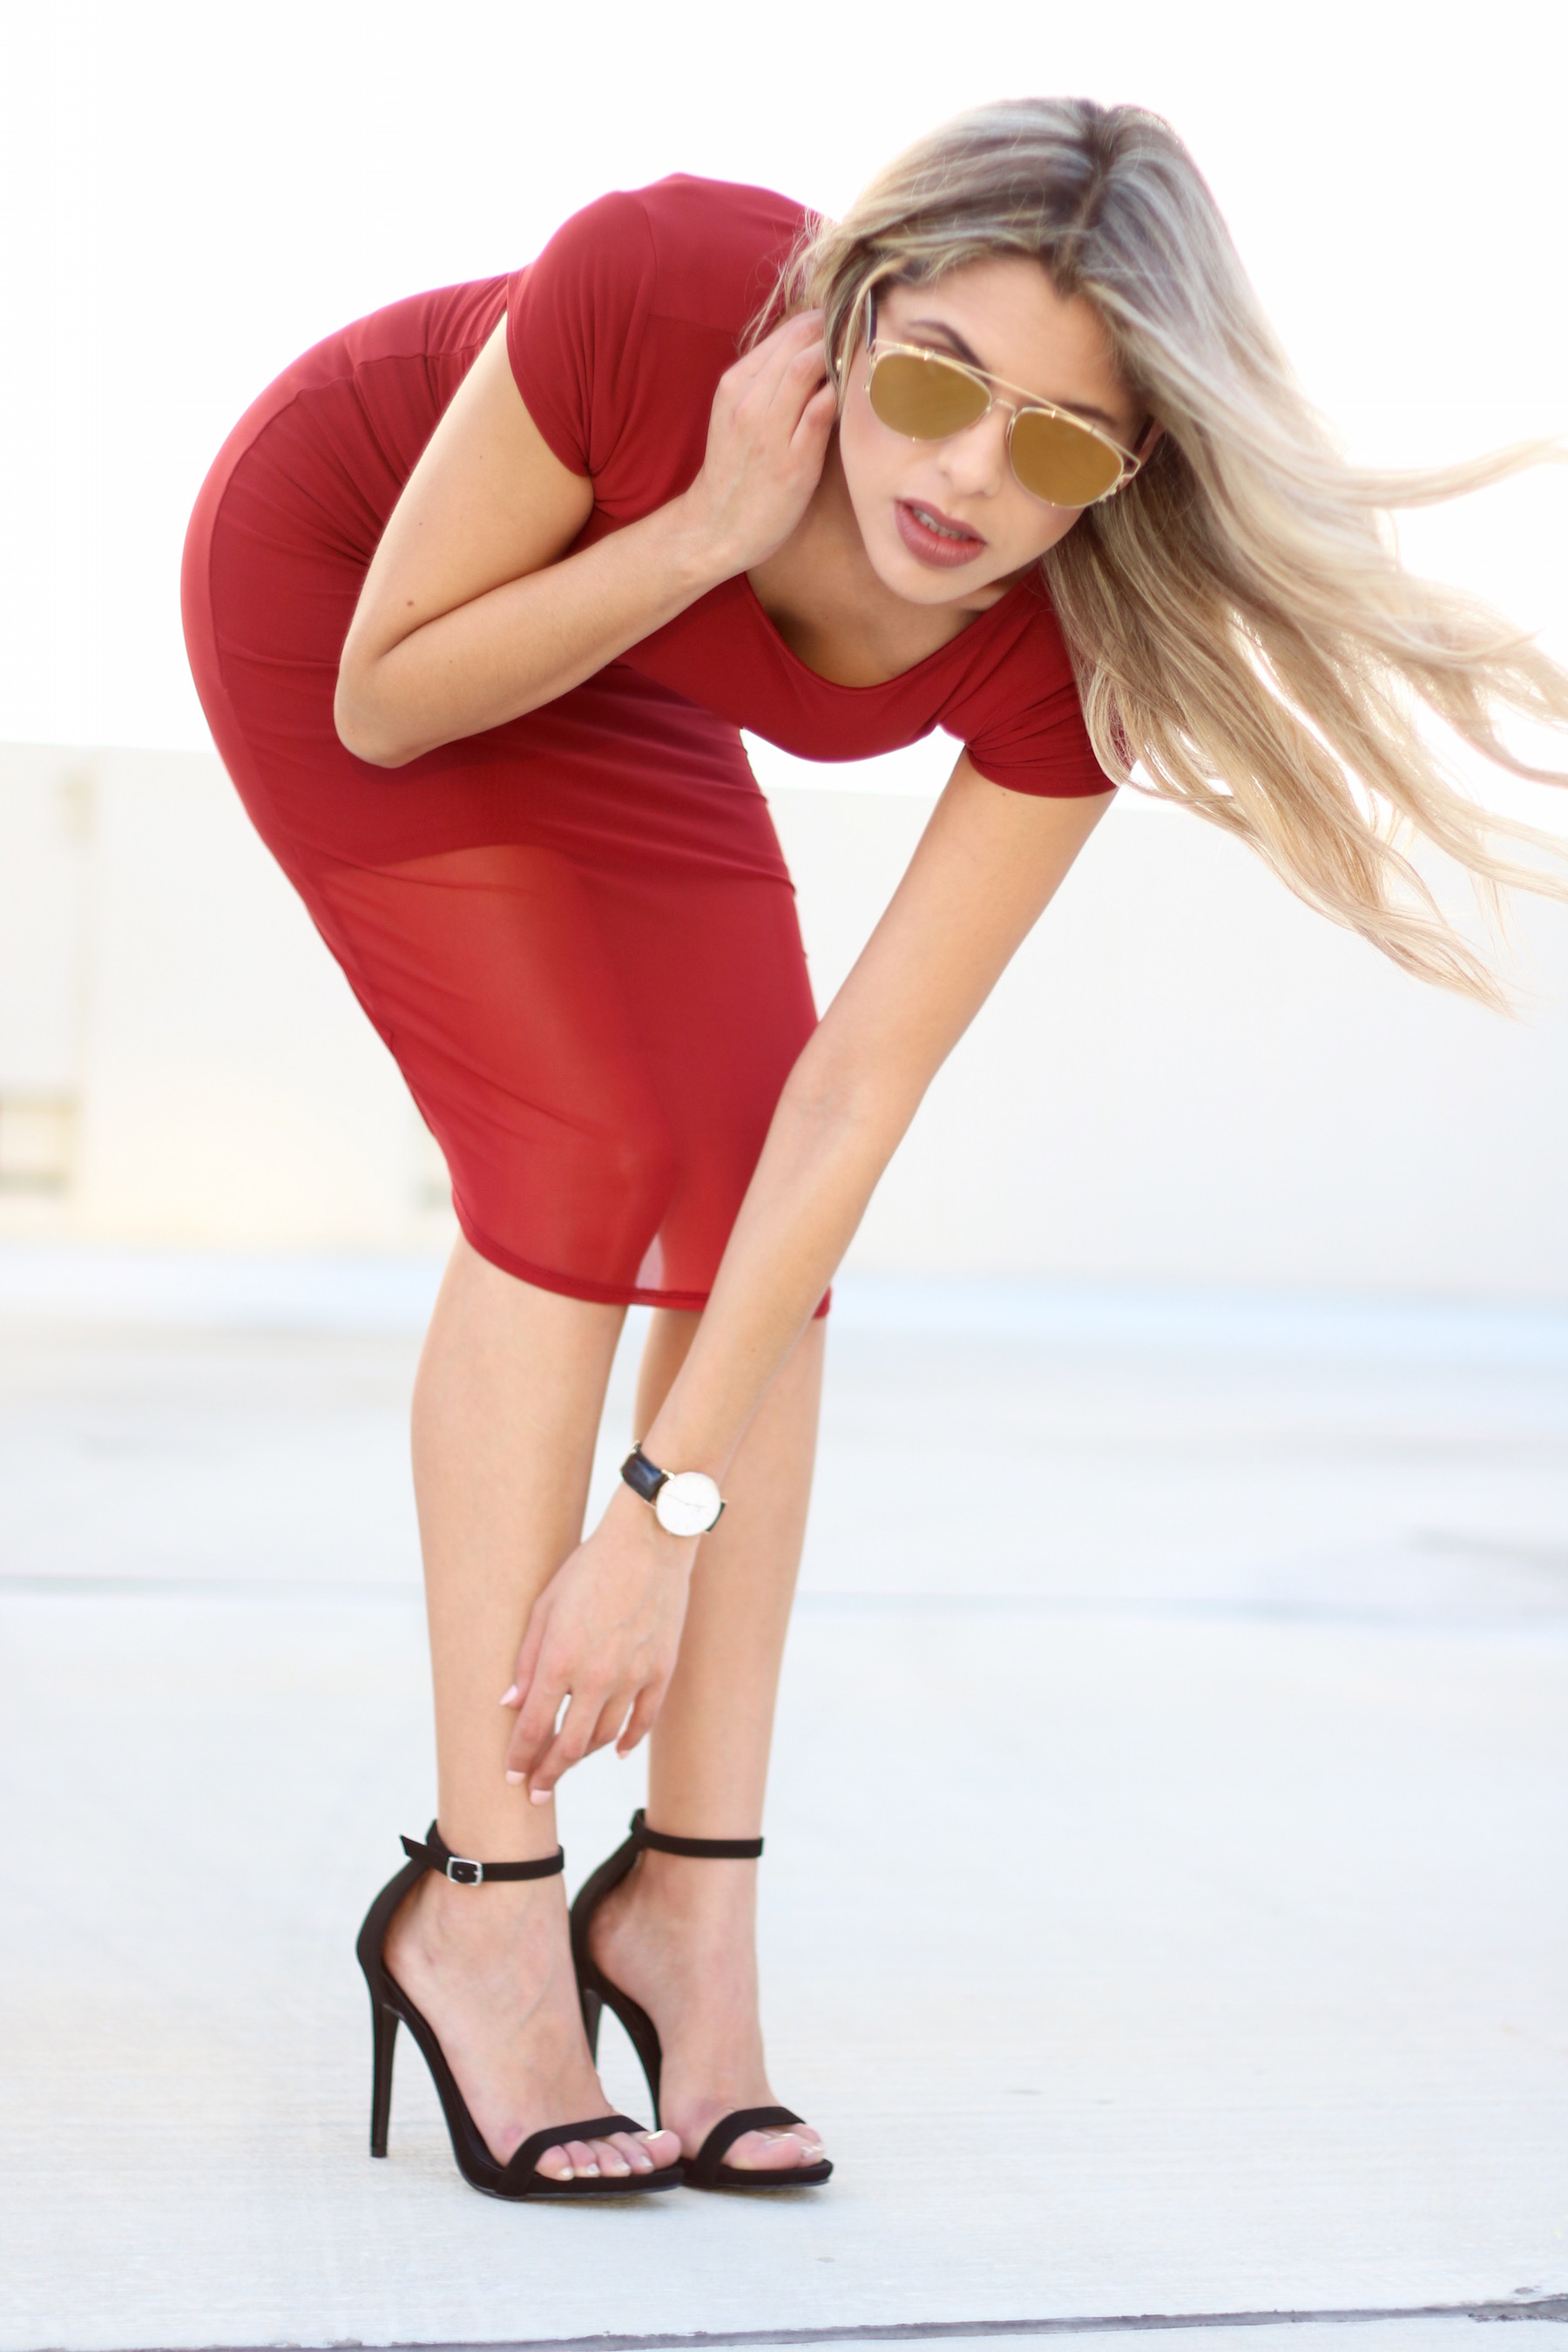 Sexy-red dress